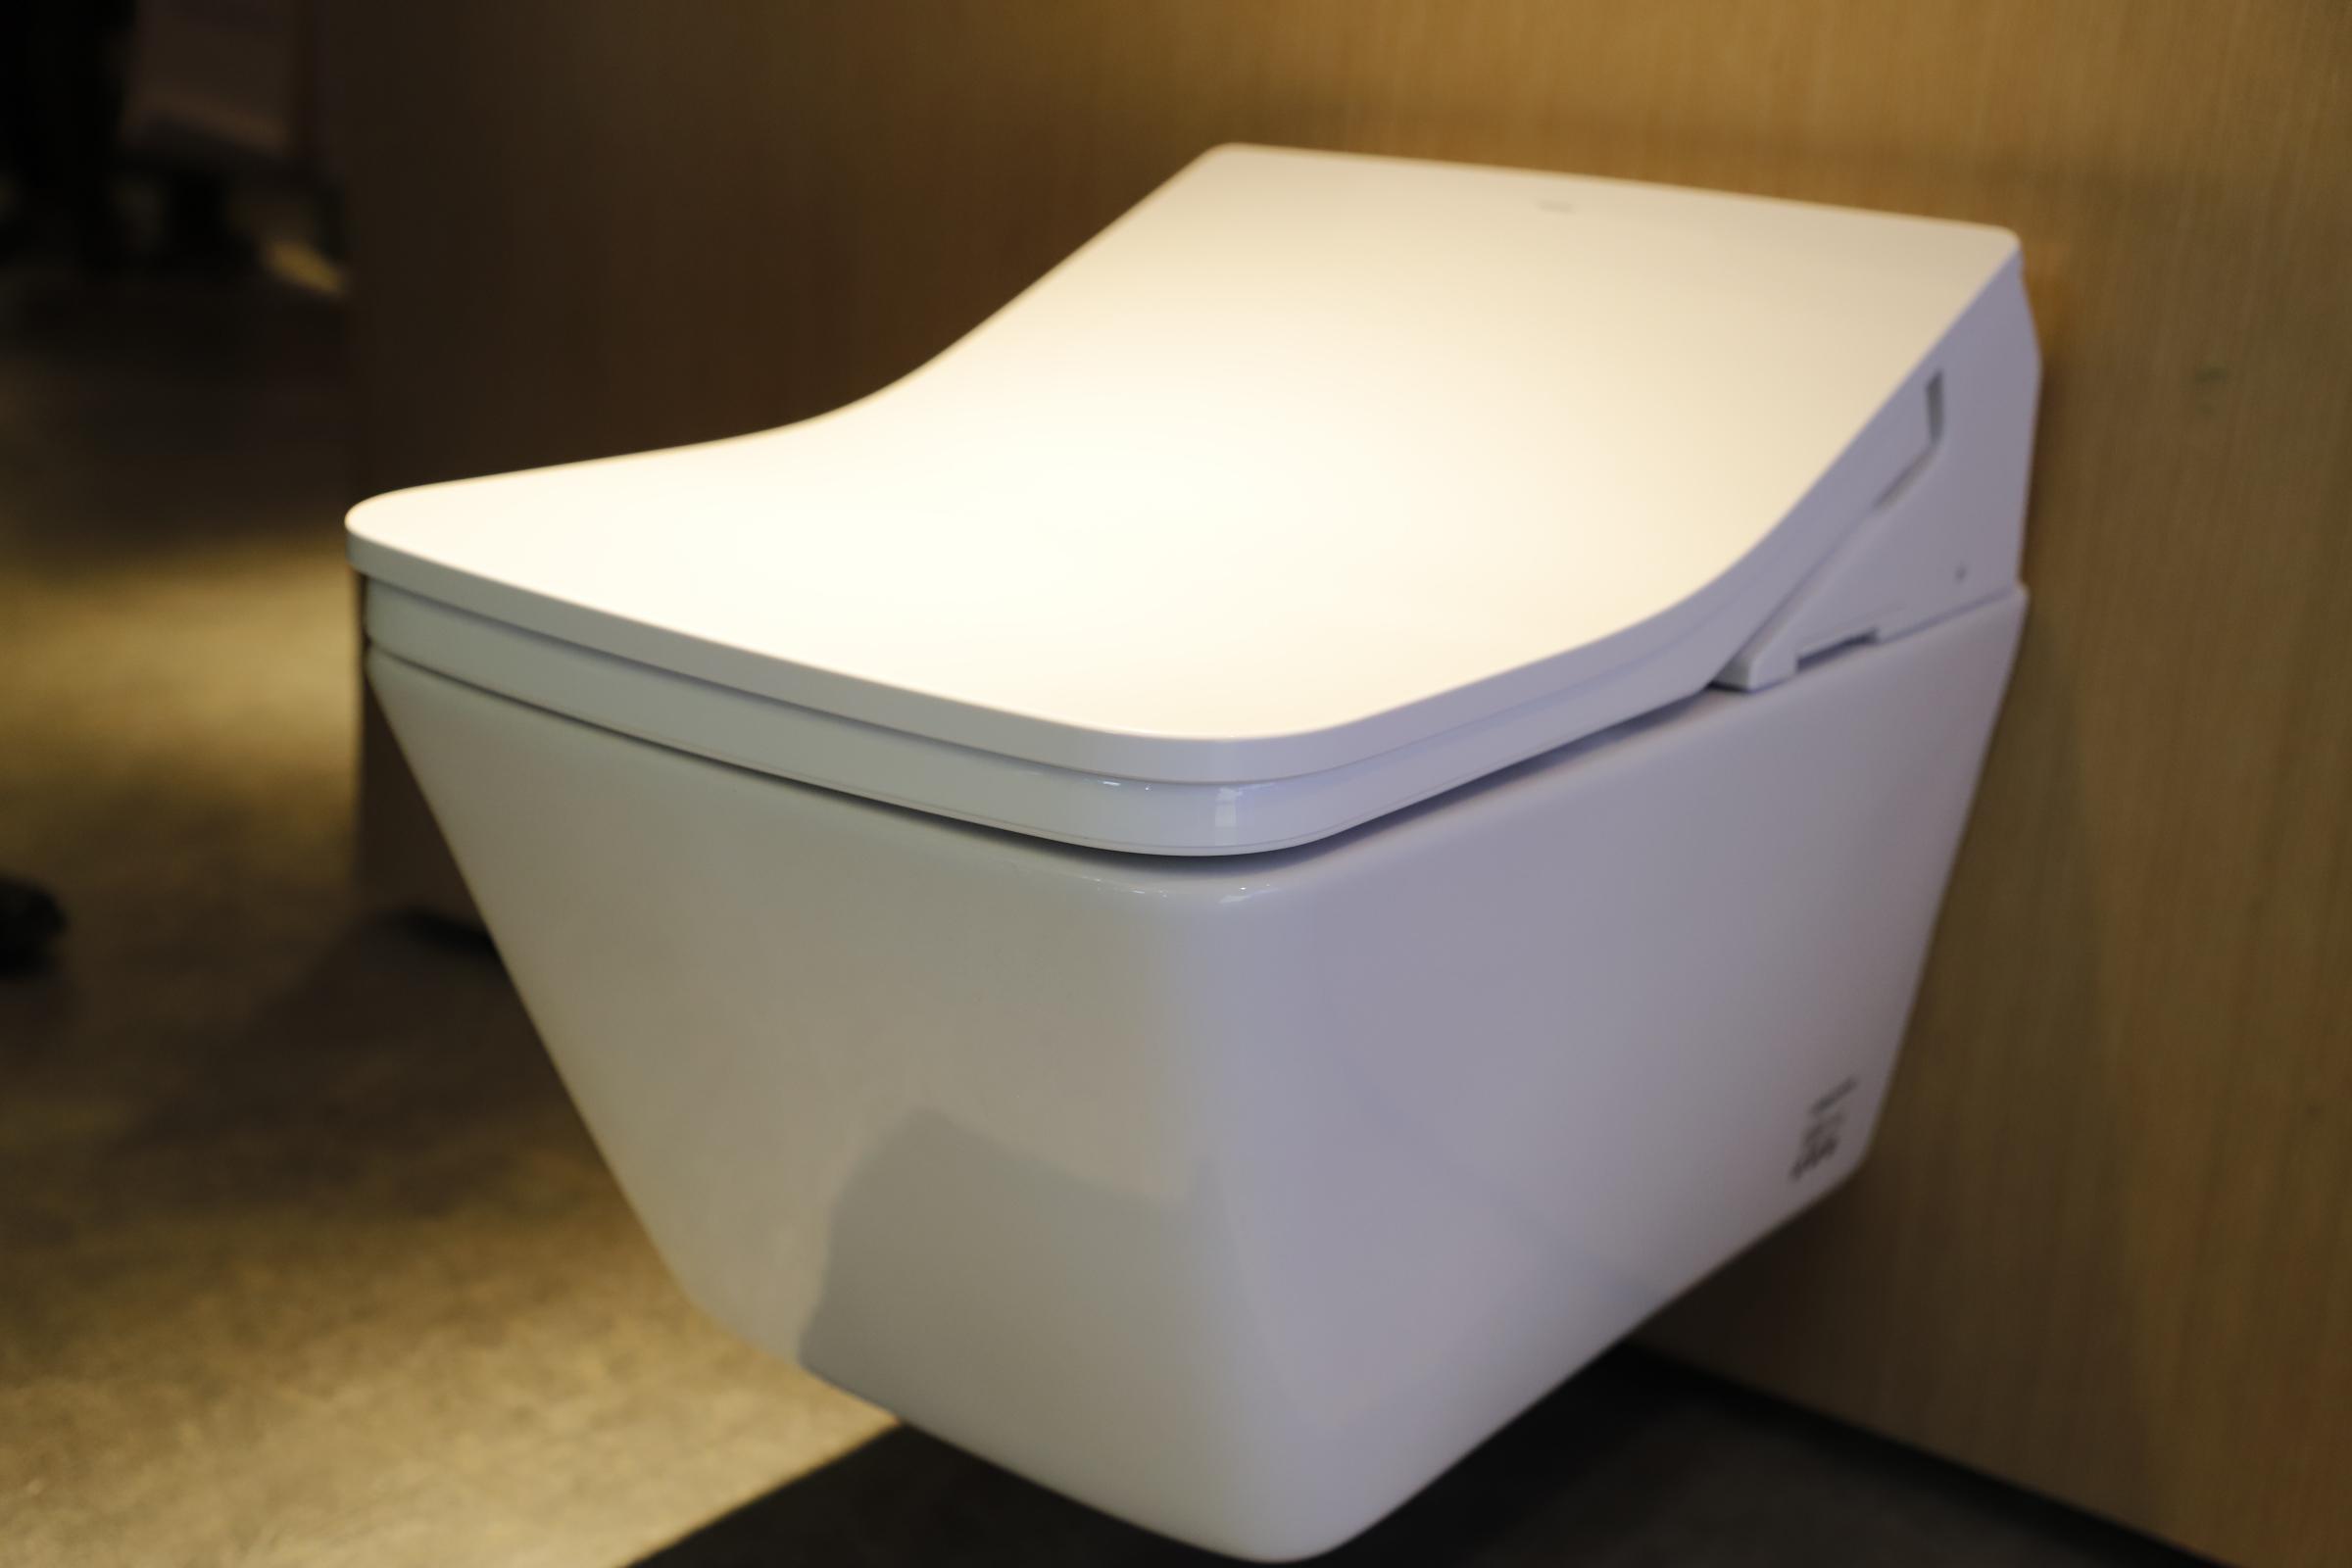 TOTO:智能洁净系统,污垢浮在陶瓷表面,难以粘附;智净消毒,去除喷嘴细菌健康无忧;漩涡式强劲冲洗。